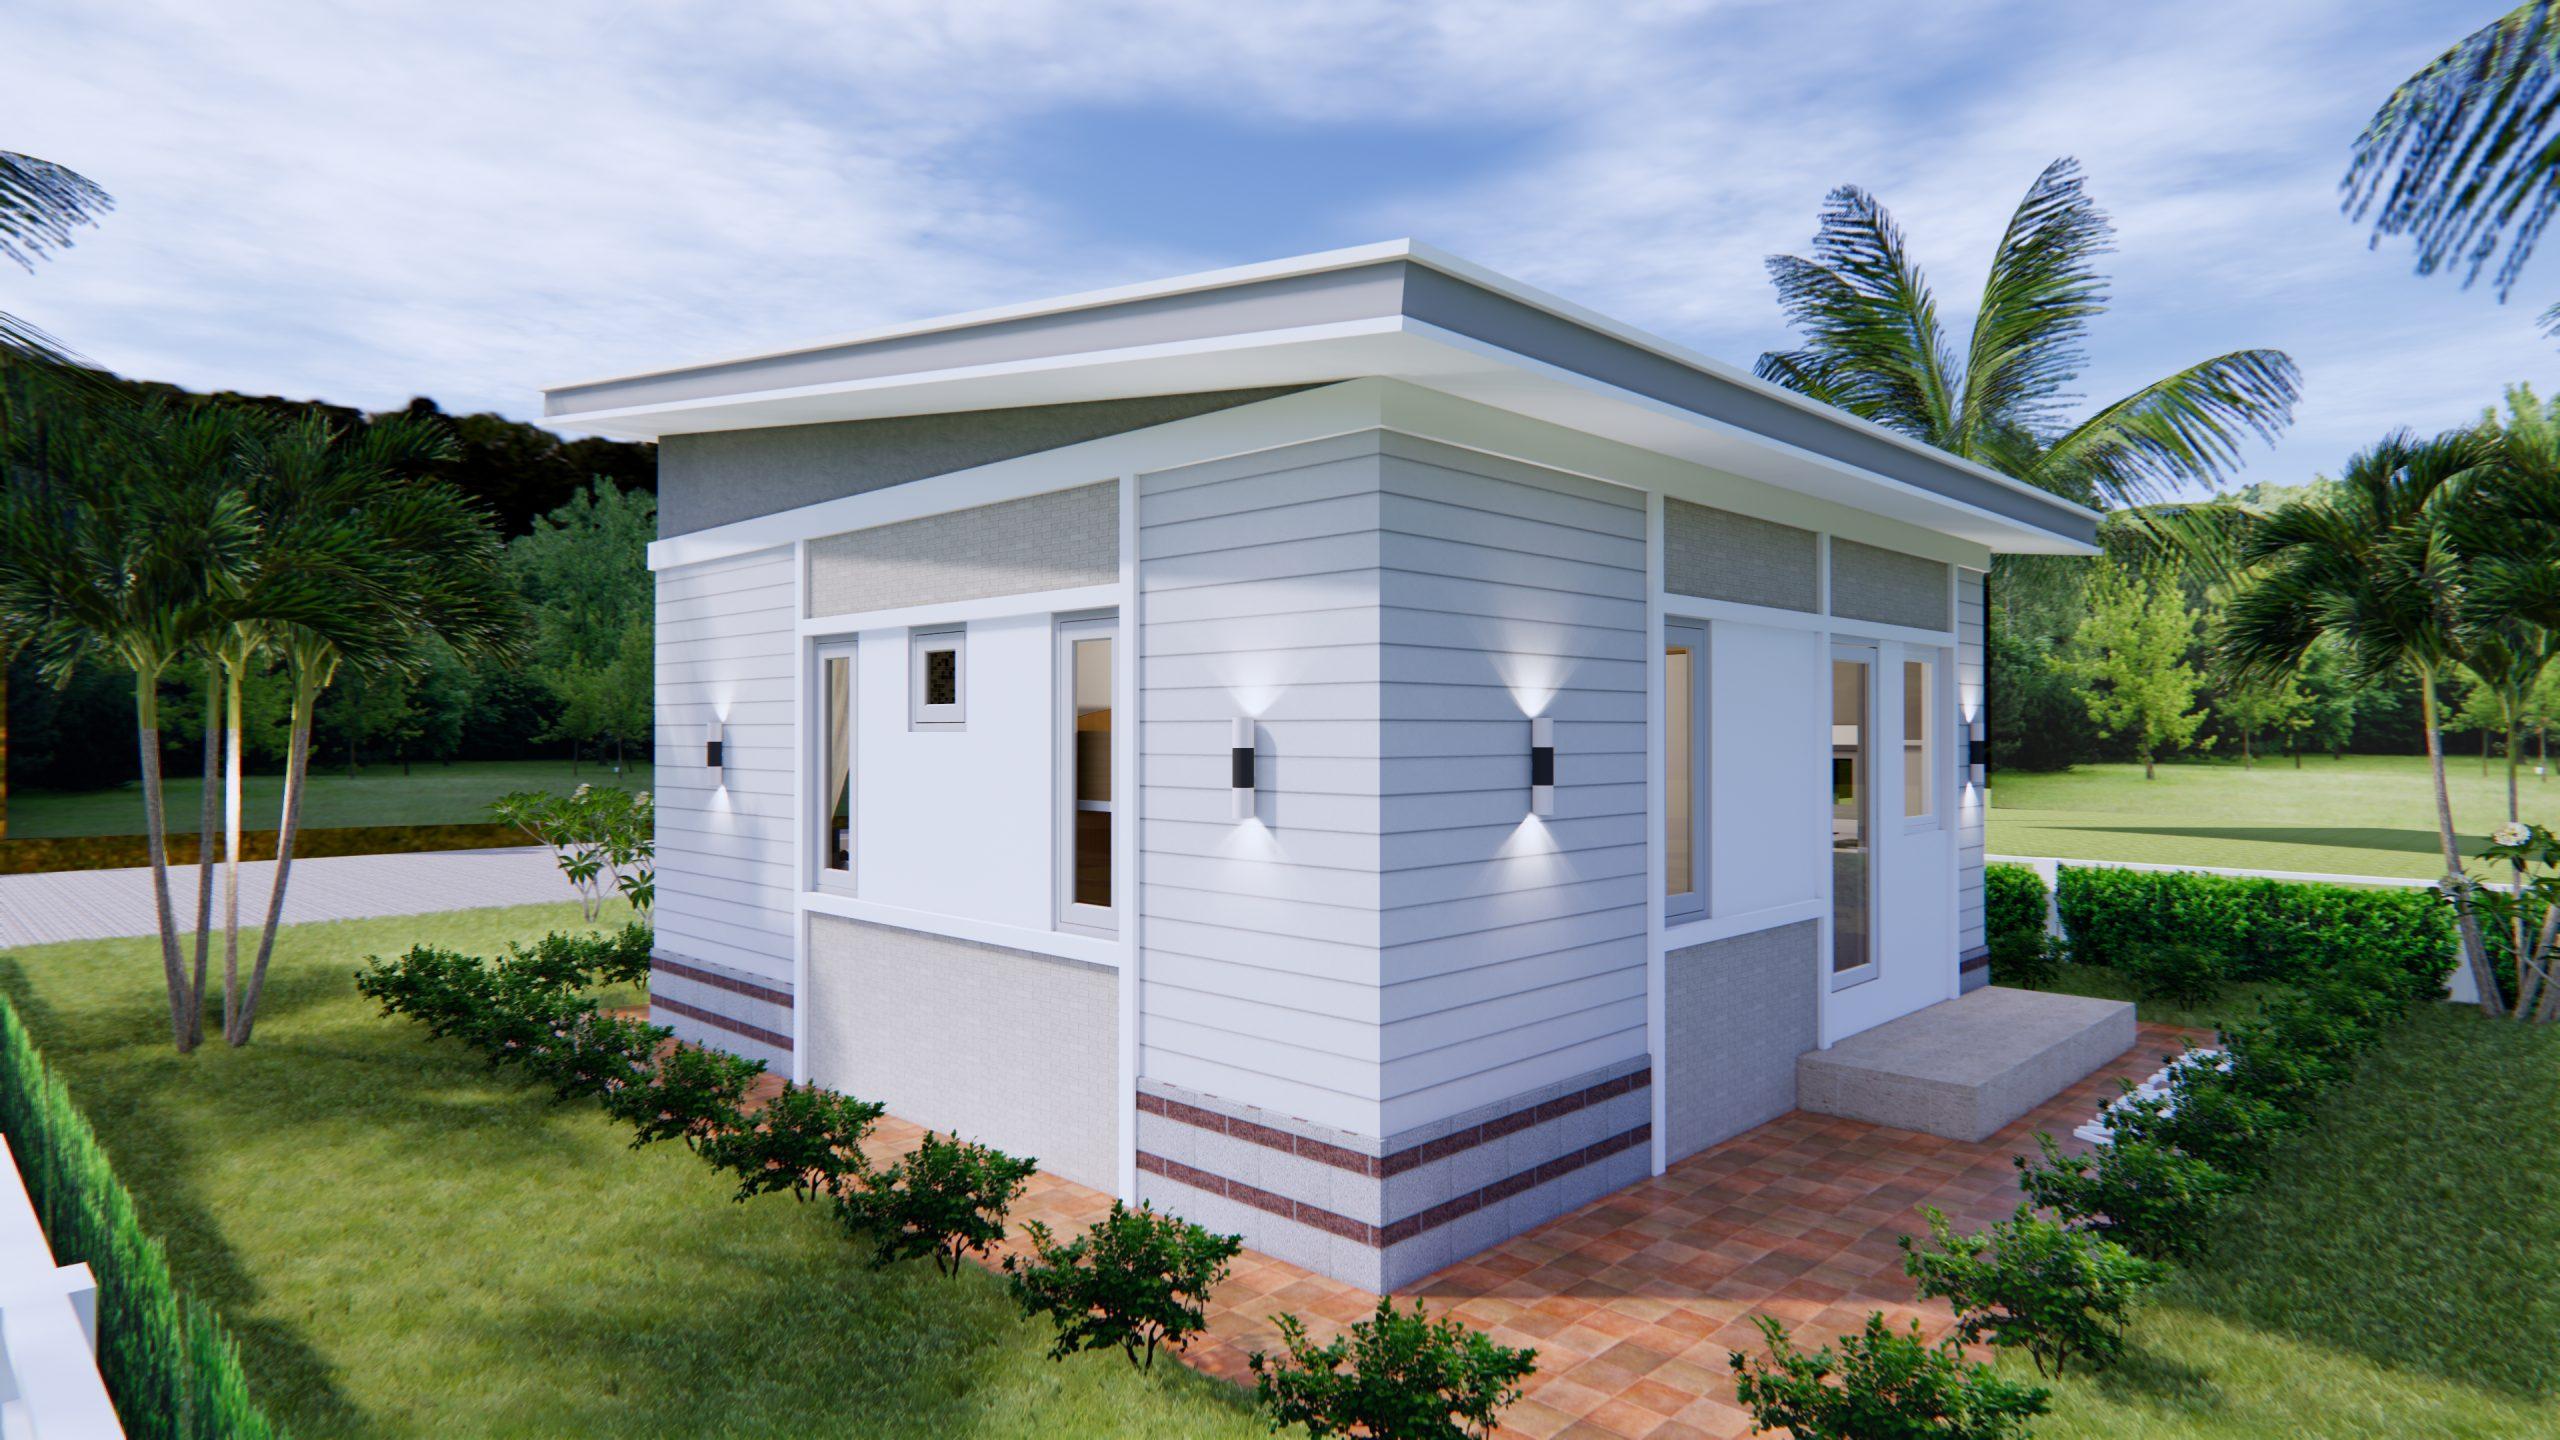 Modern Tiny Homes 7x7 Meters 24x24 Feet 4